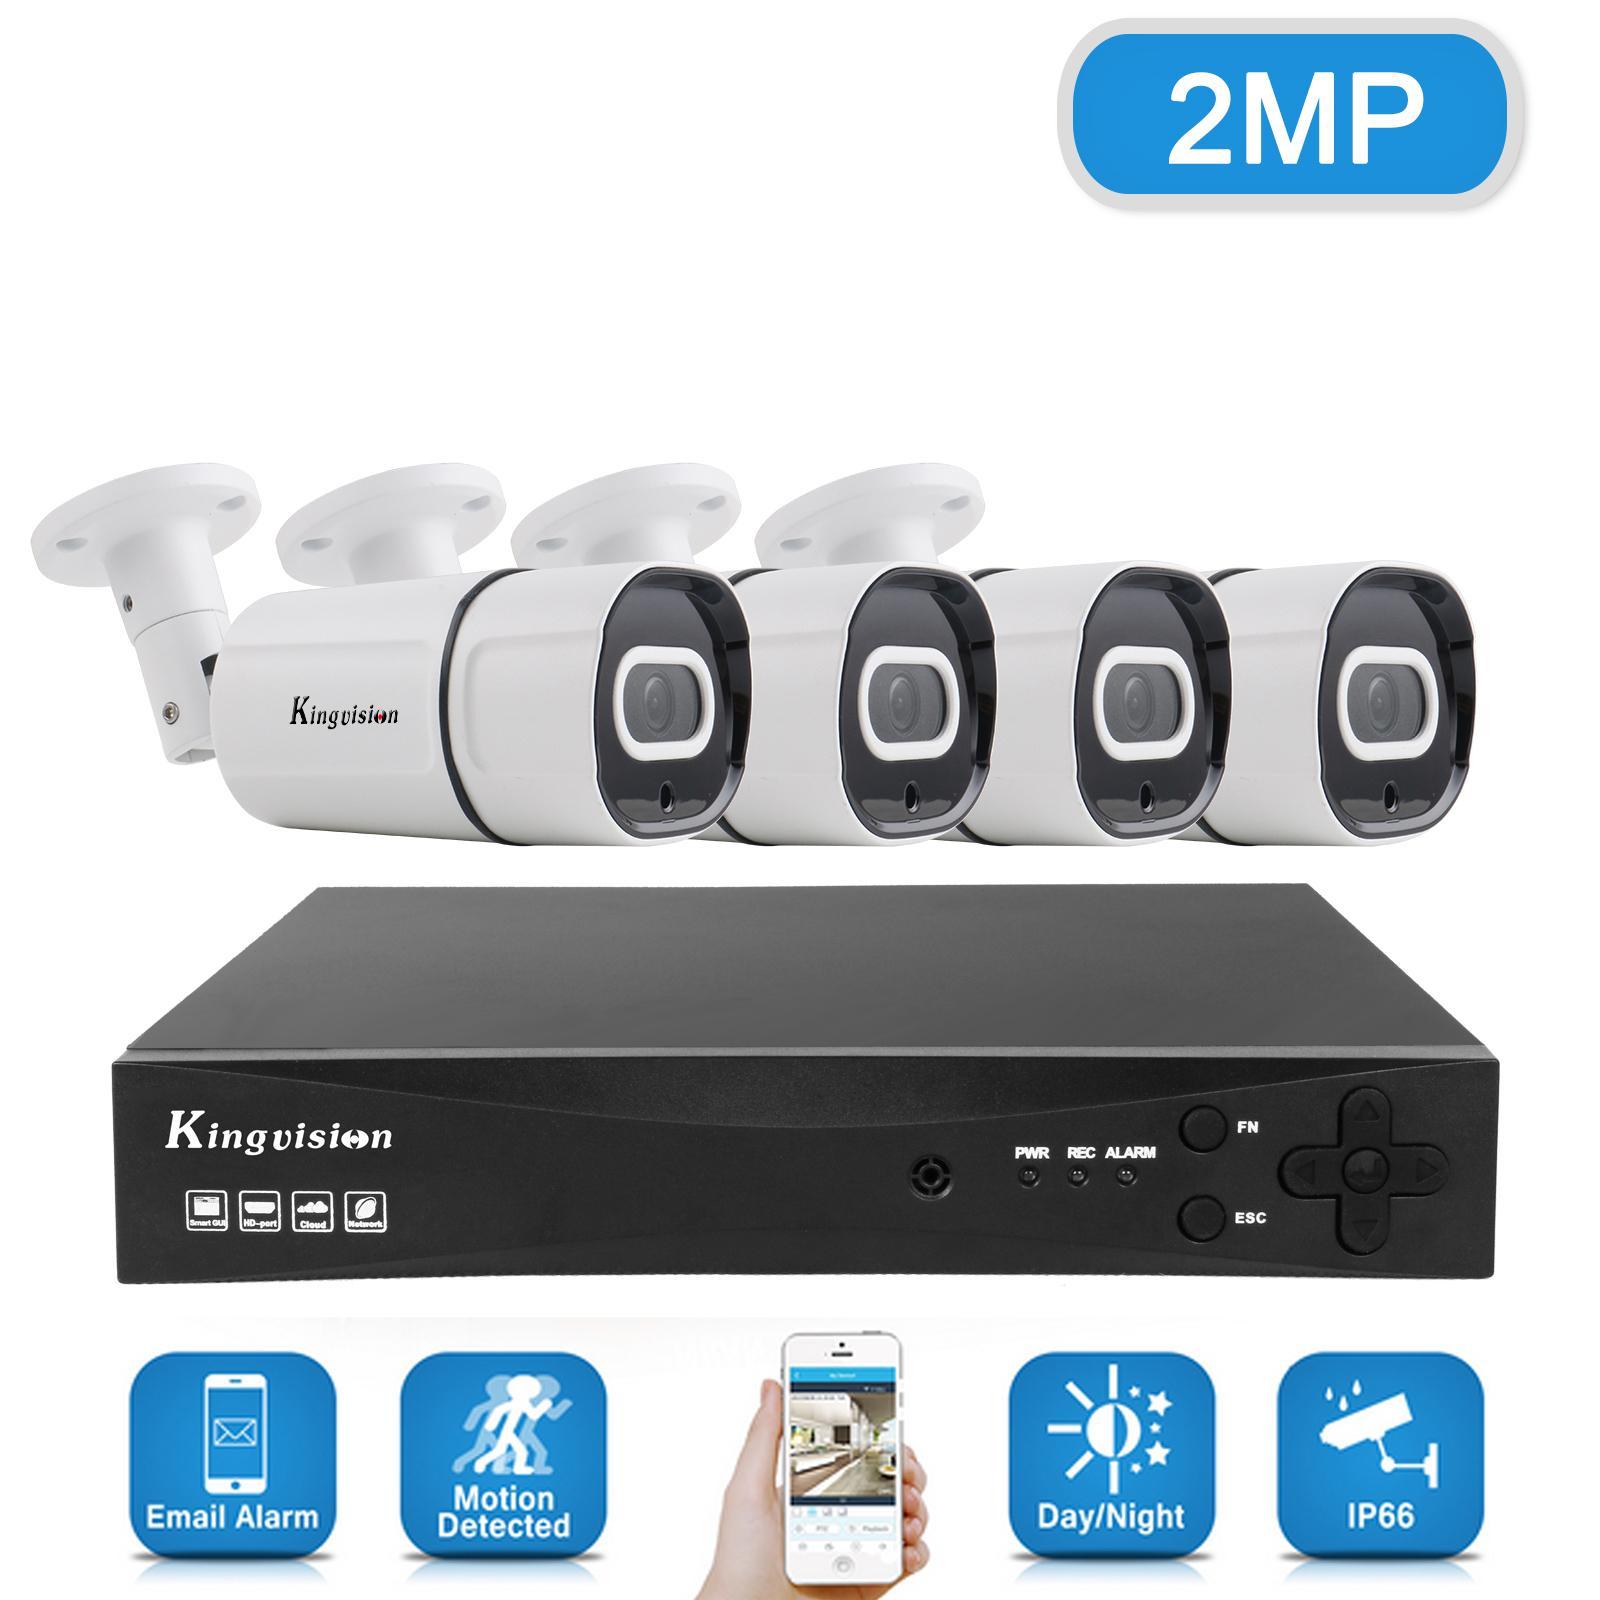 4 / 8CH 2MP سجل الصوت DVR نظام الأمن الكاميرا كيت AHD كاميرا الأشعة تحت الحمراء في الهواء الطلق مقاوم للماء CCTV فيديو مراقبة DVR مجموعة